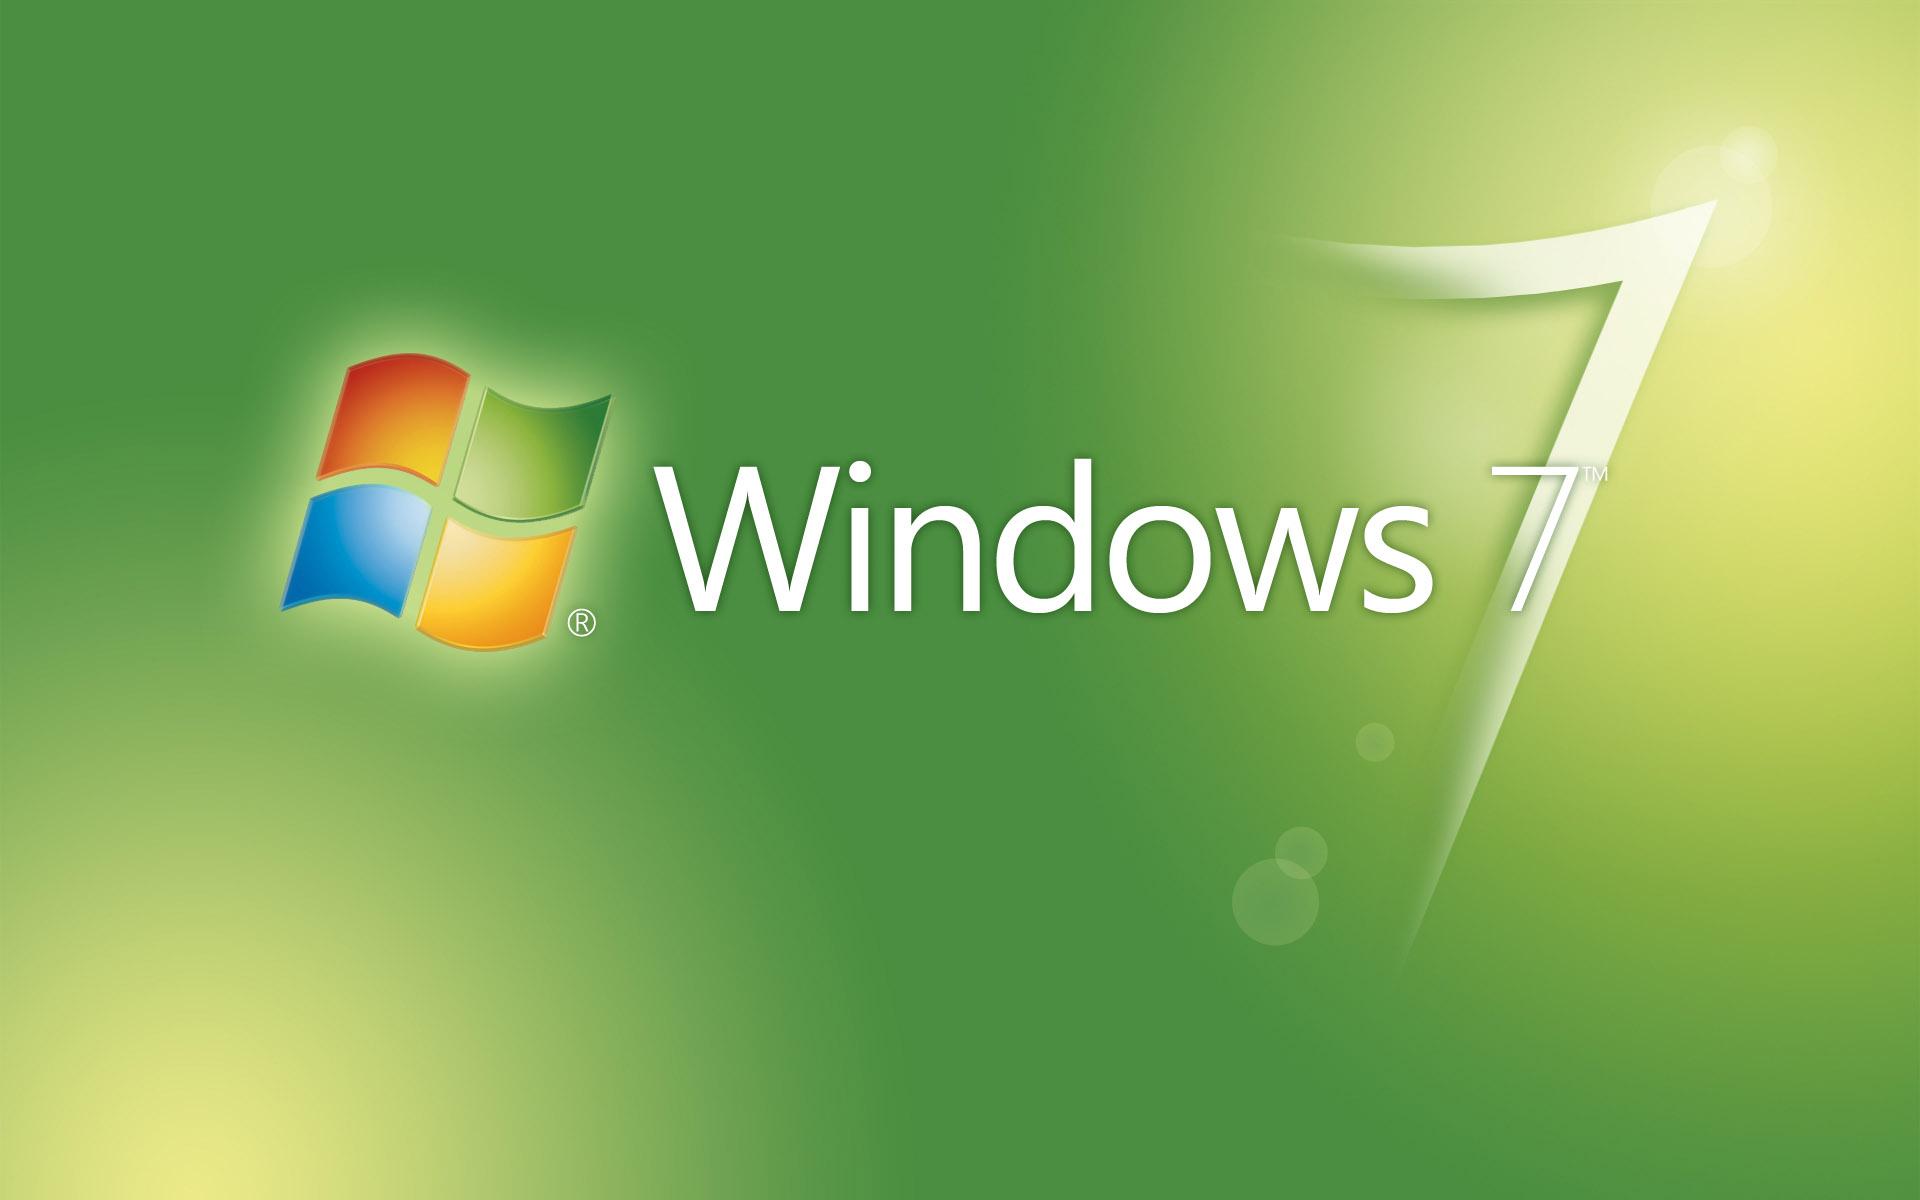 cool desktop backgrounds for windows 7 wallpaper desktop windows 7 1920x1200